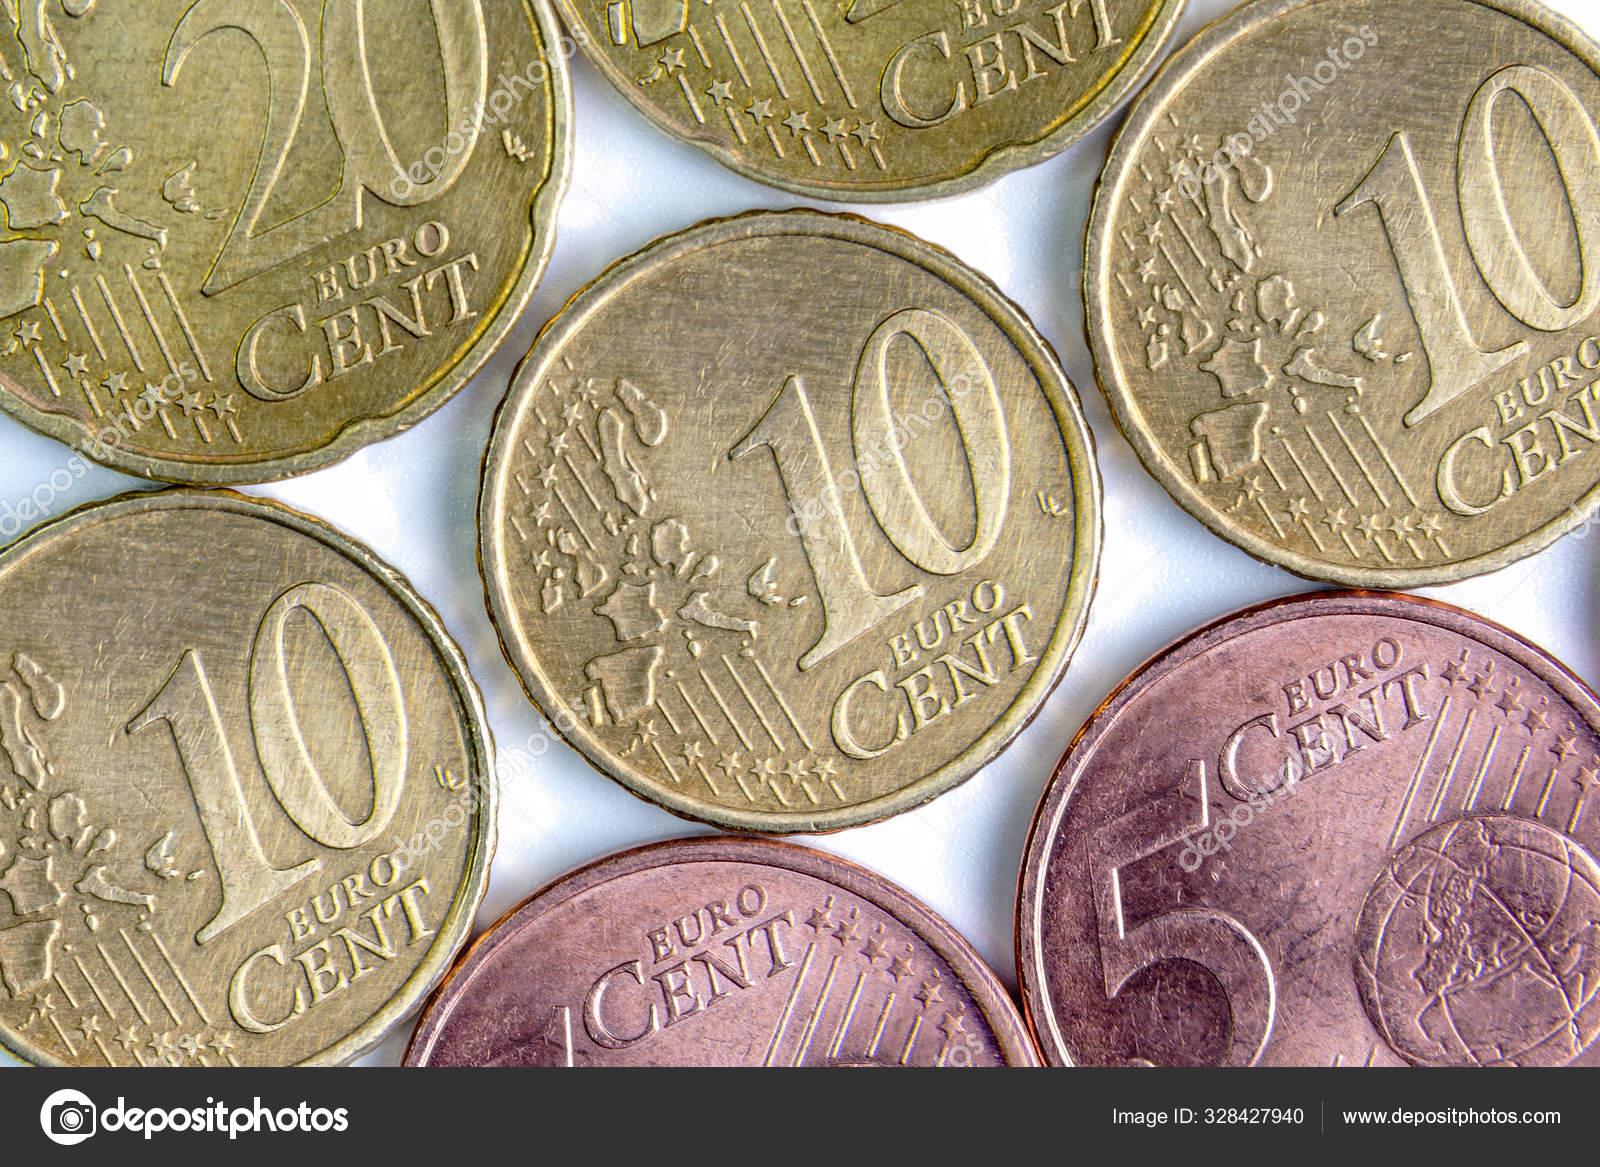 Stockfotos 20 евро центов Bilder, Stockfotografie 20 евро центов ...